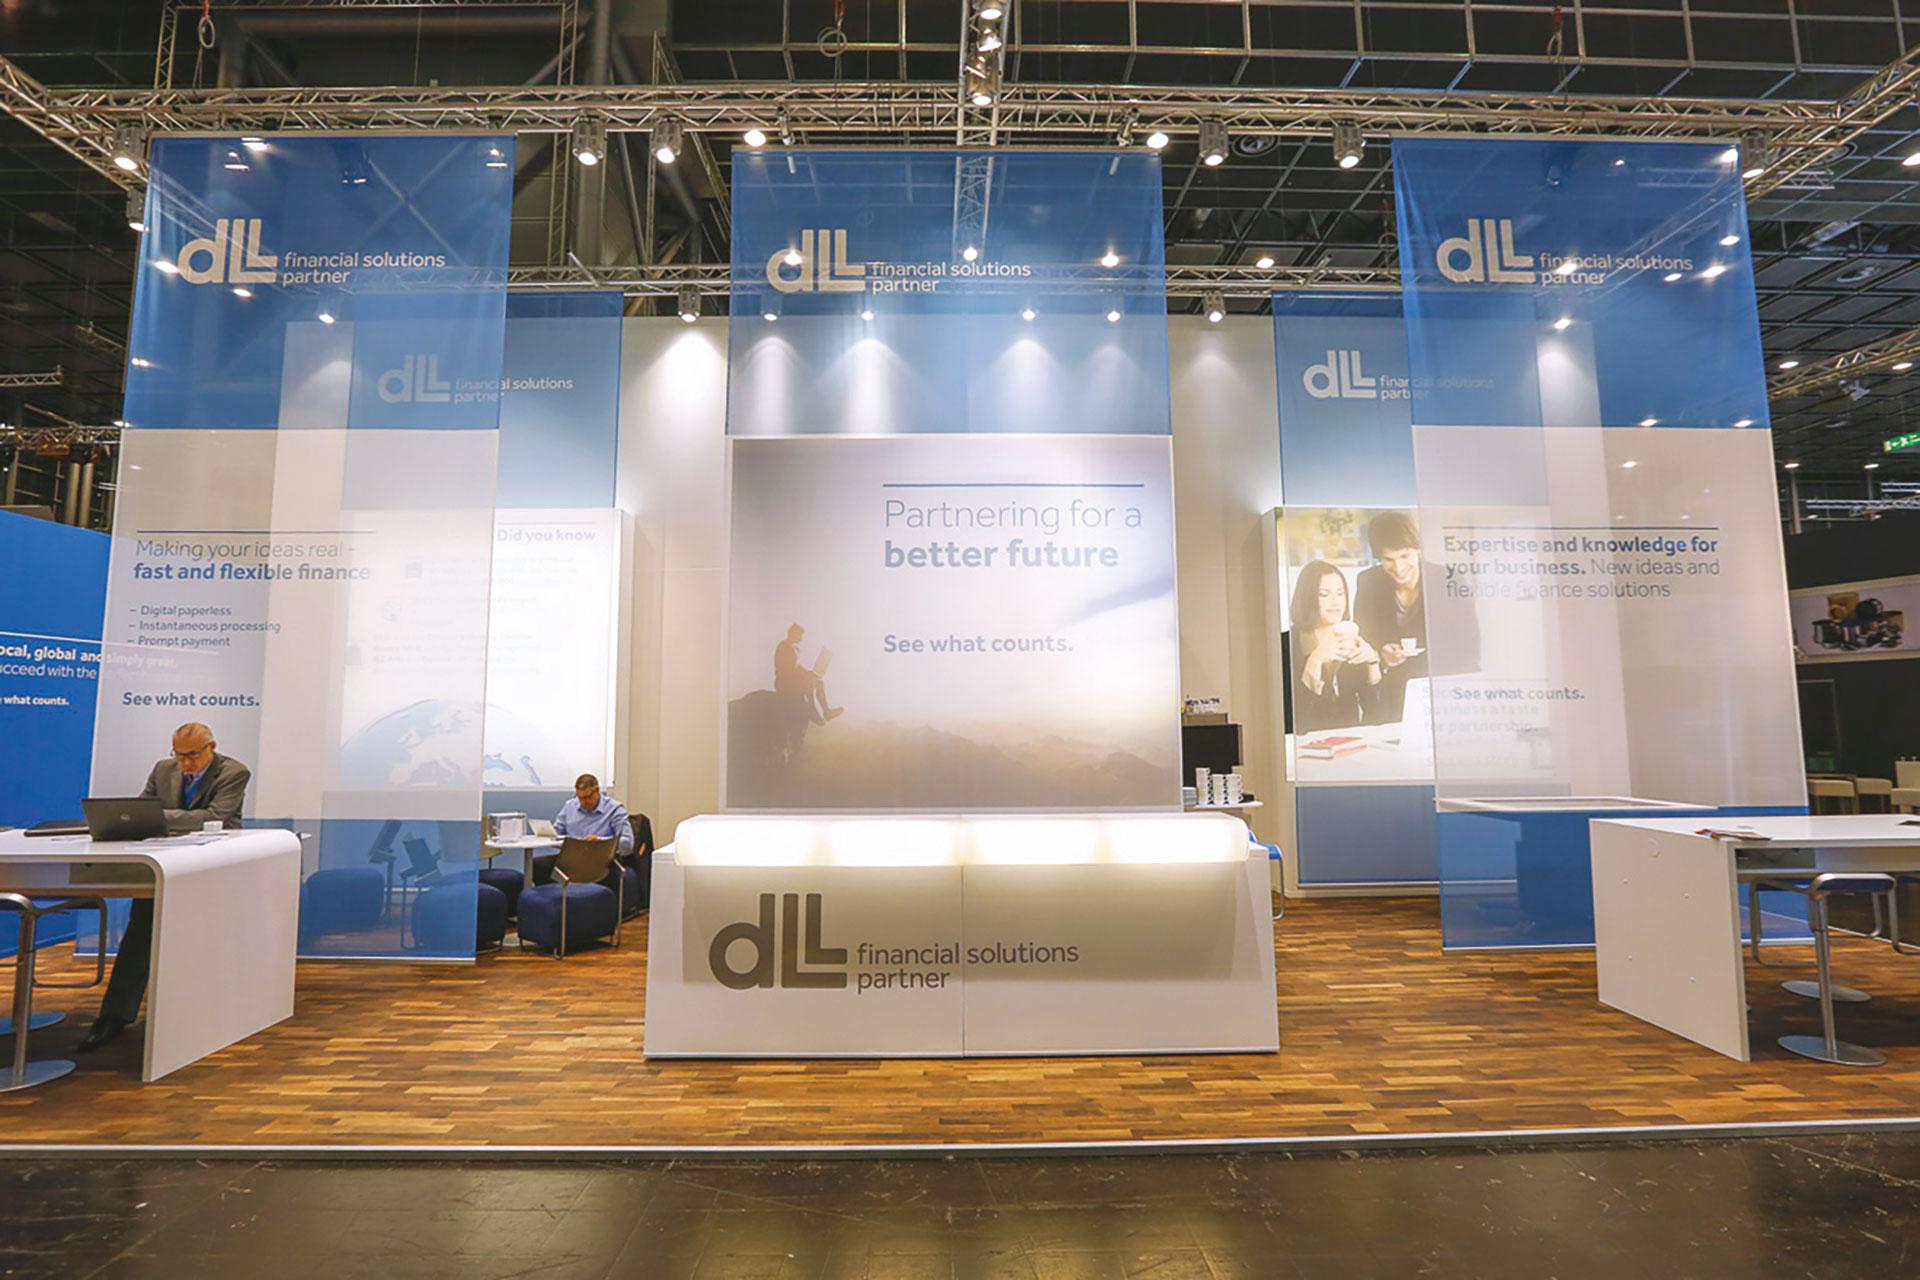 DLL Drupa Impressionen